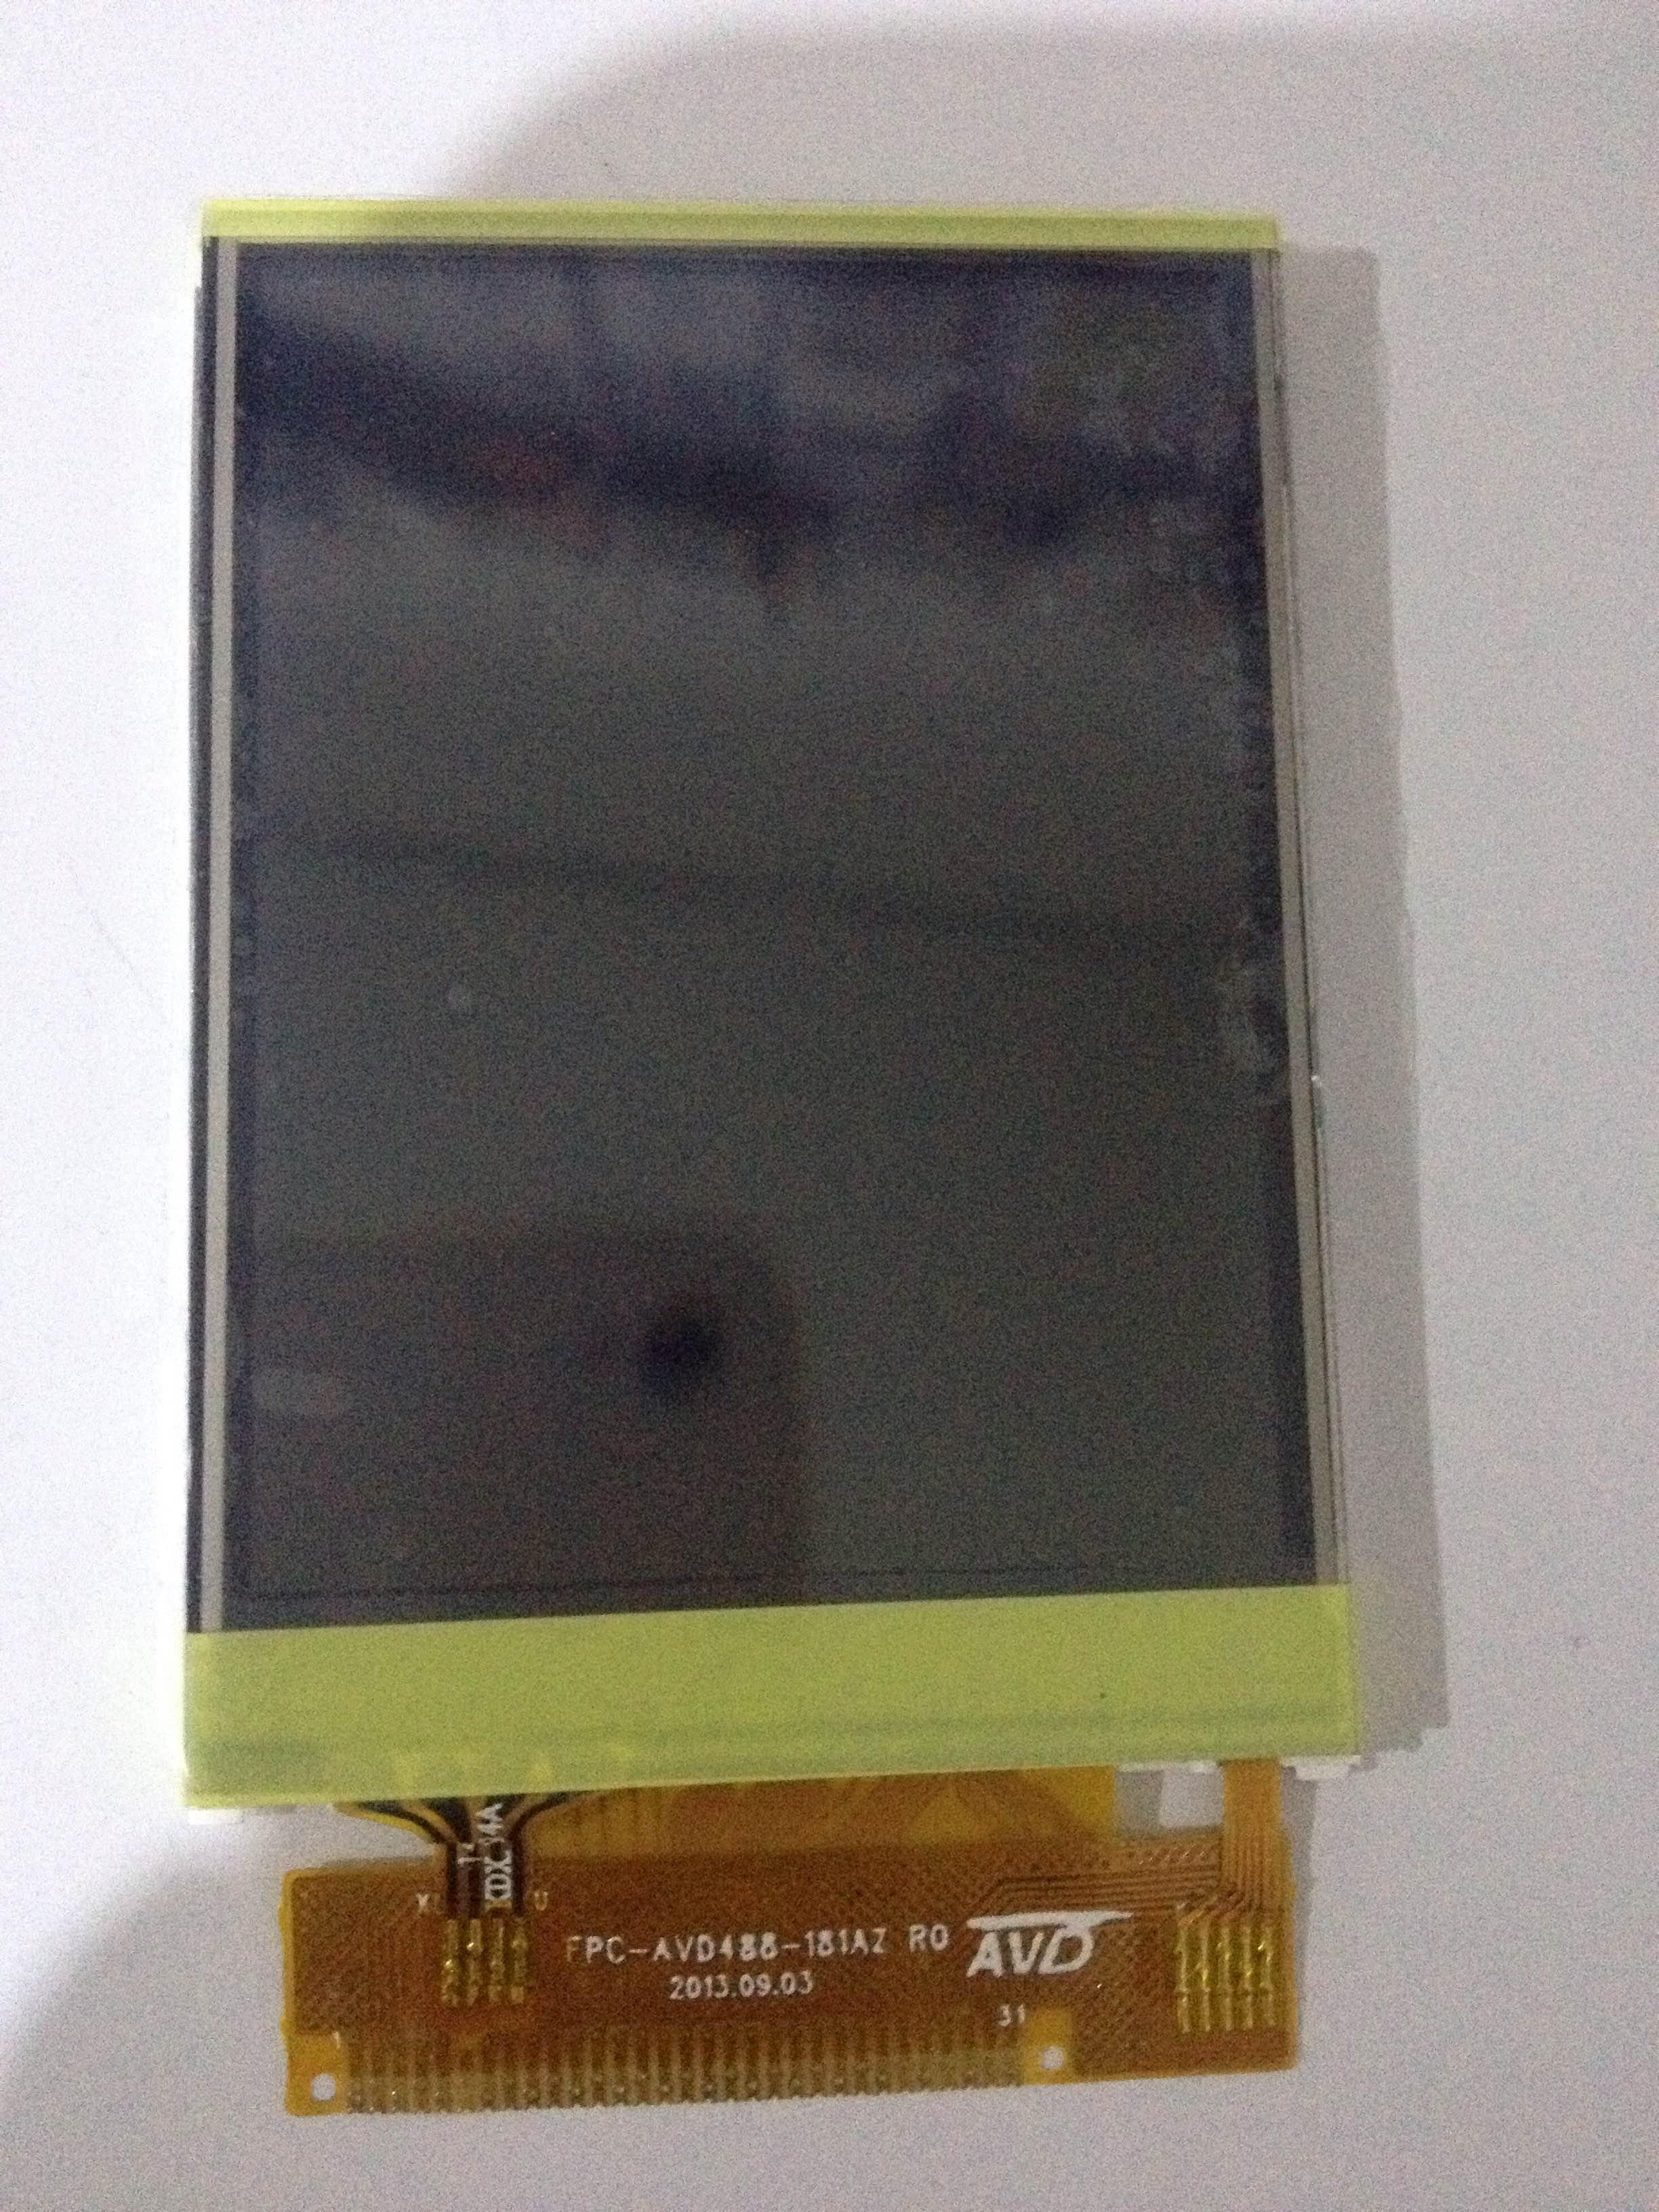 Запчасти для мобильных телефонов Chino e  N828A FPC-AVD488-181AZ R0 запчасти для мобильных телефонов zte u790 v790 n790 n790s